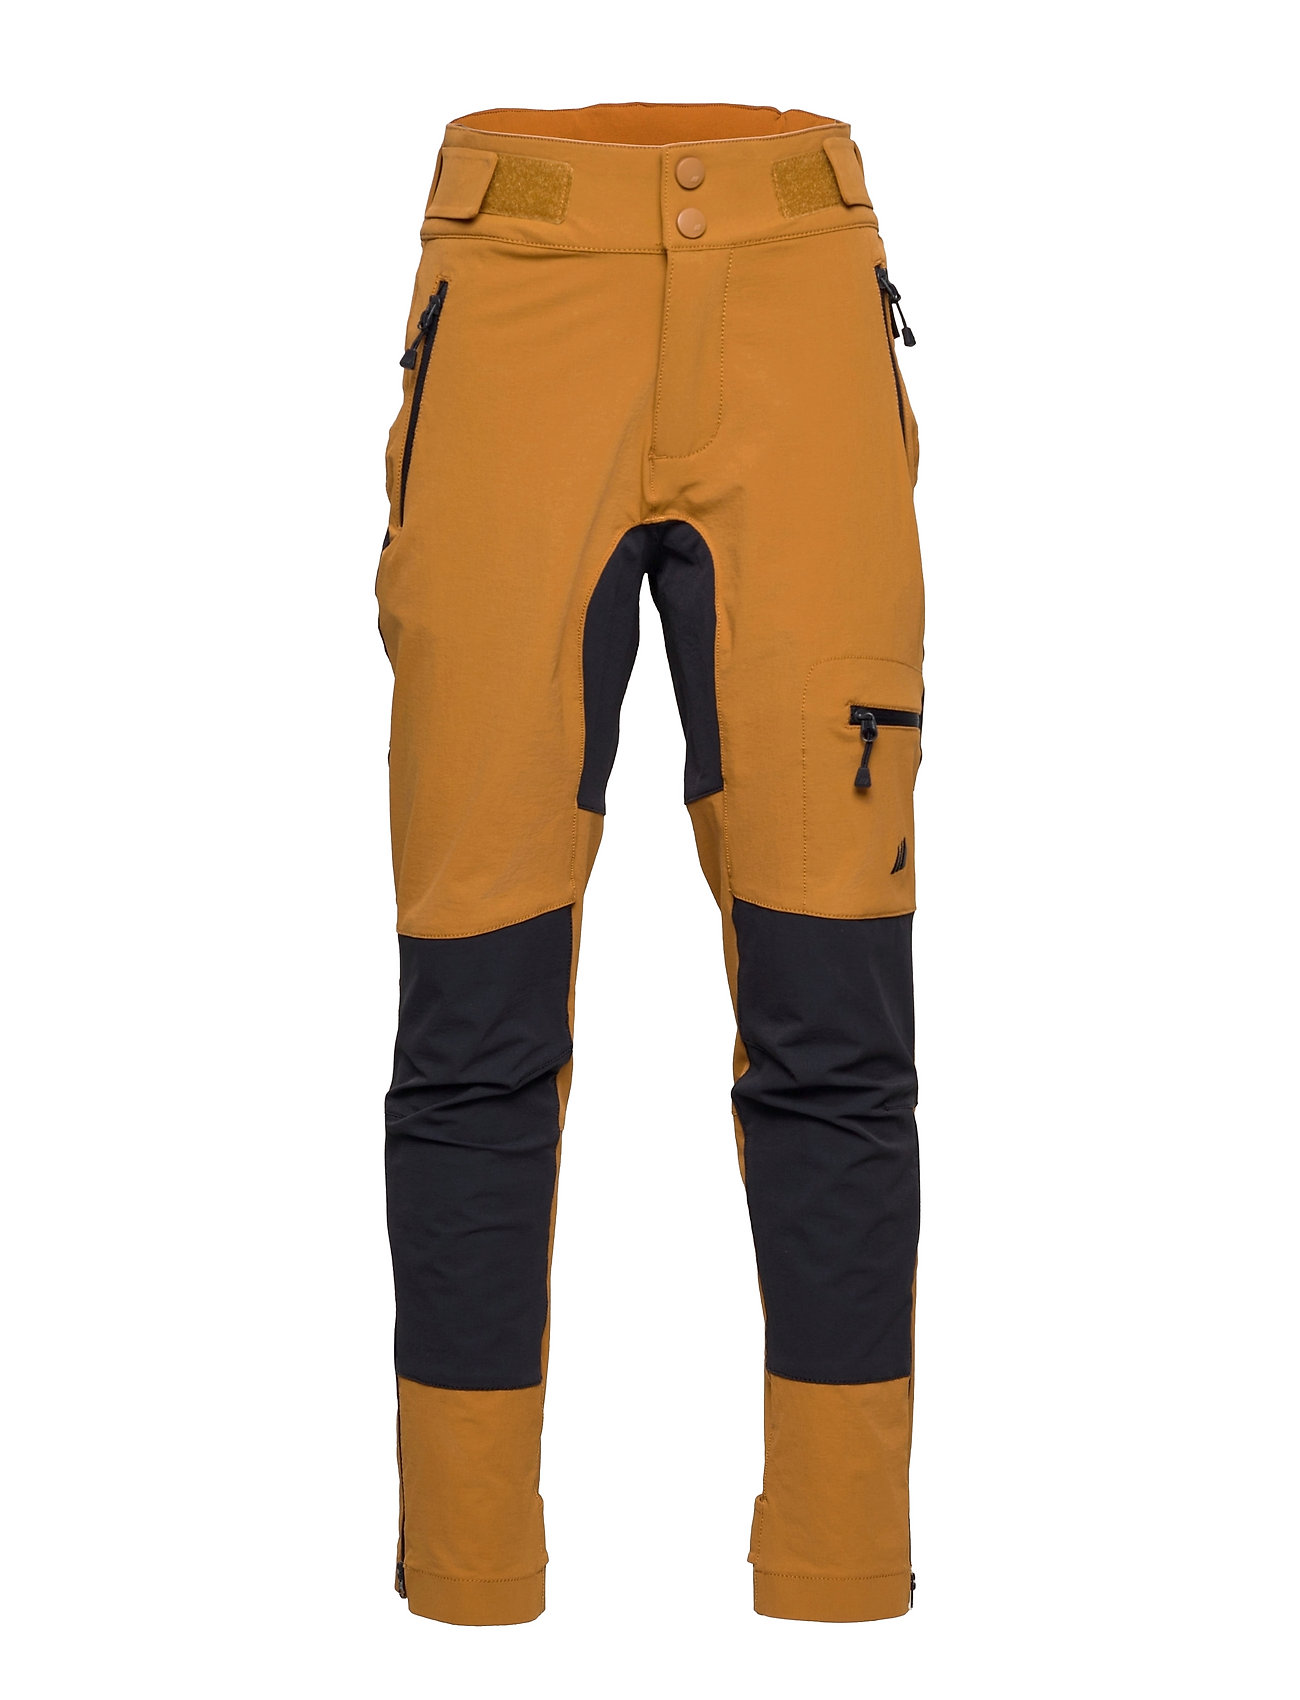 LøNahorgi Hiking Trousers Outerwear Softshells Softshell Trousers Gul Skogstad